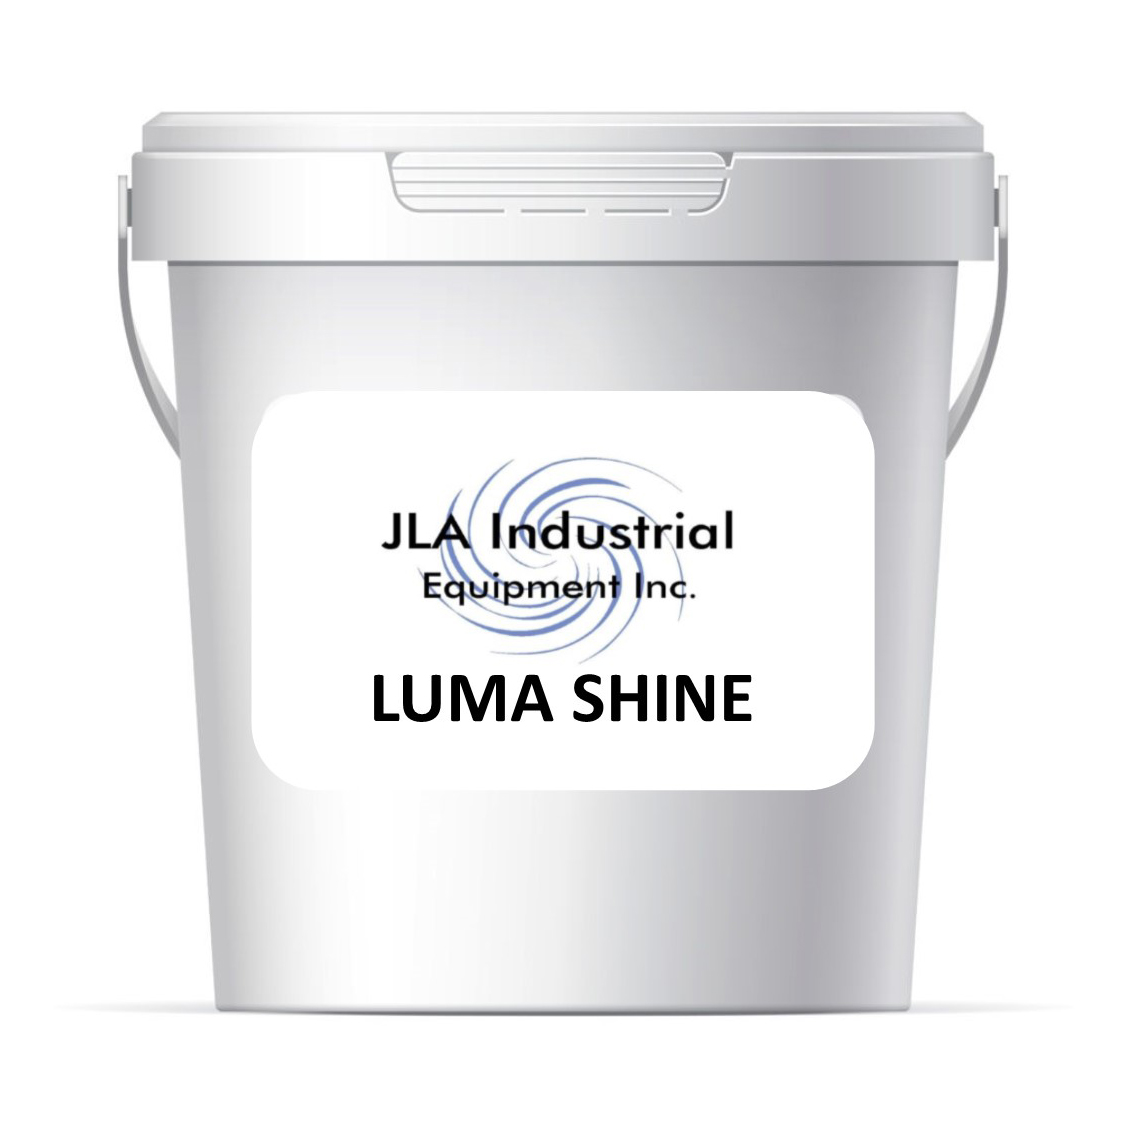 Luma Shine